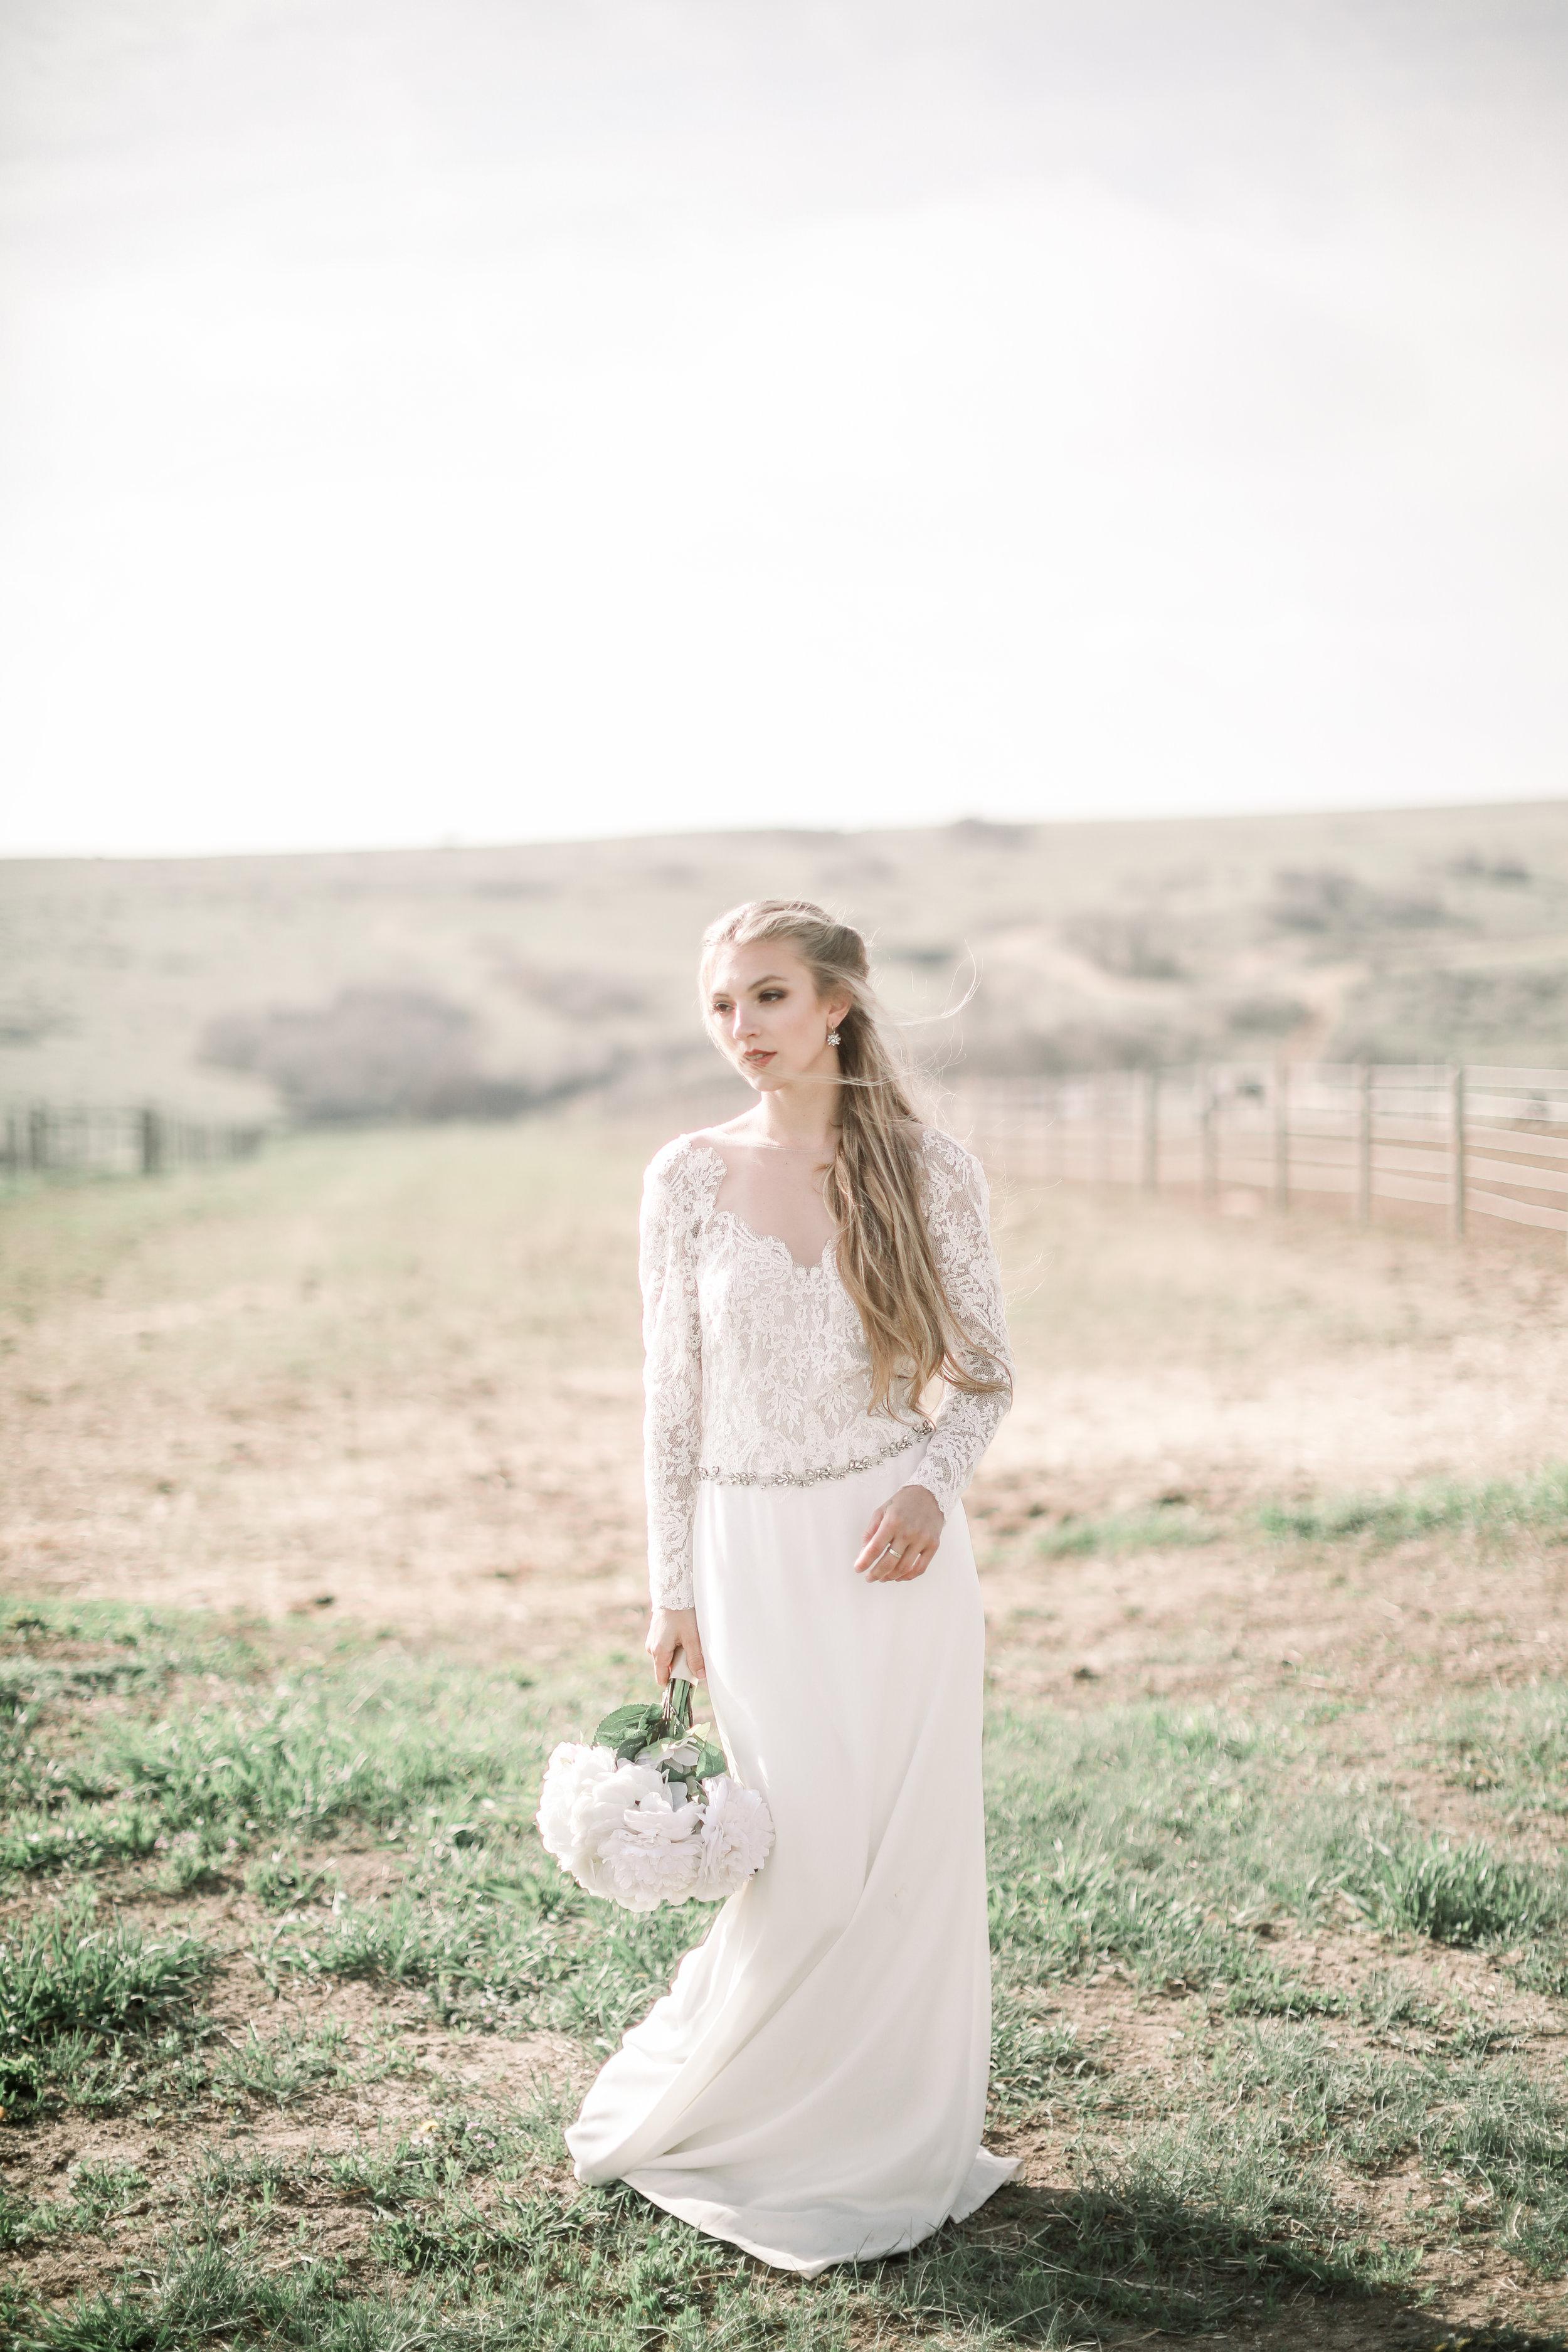 Equestrian Bridal Preview-24.jpg